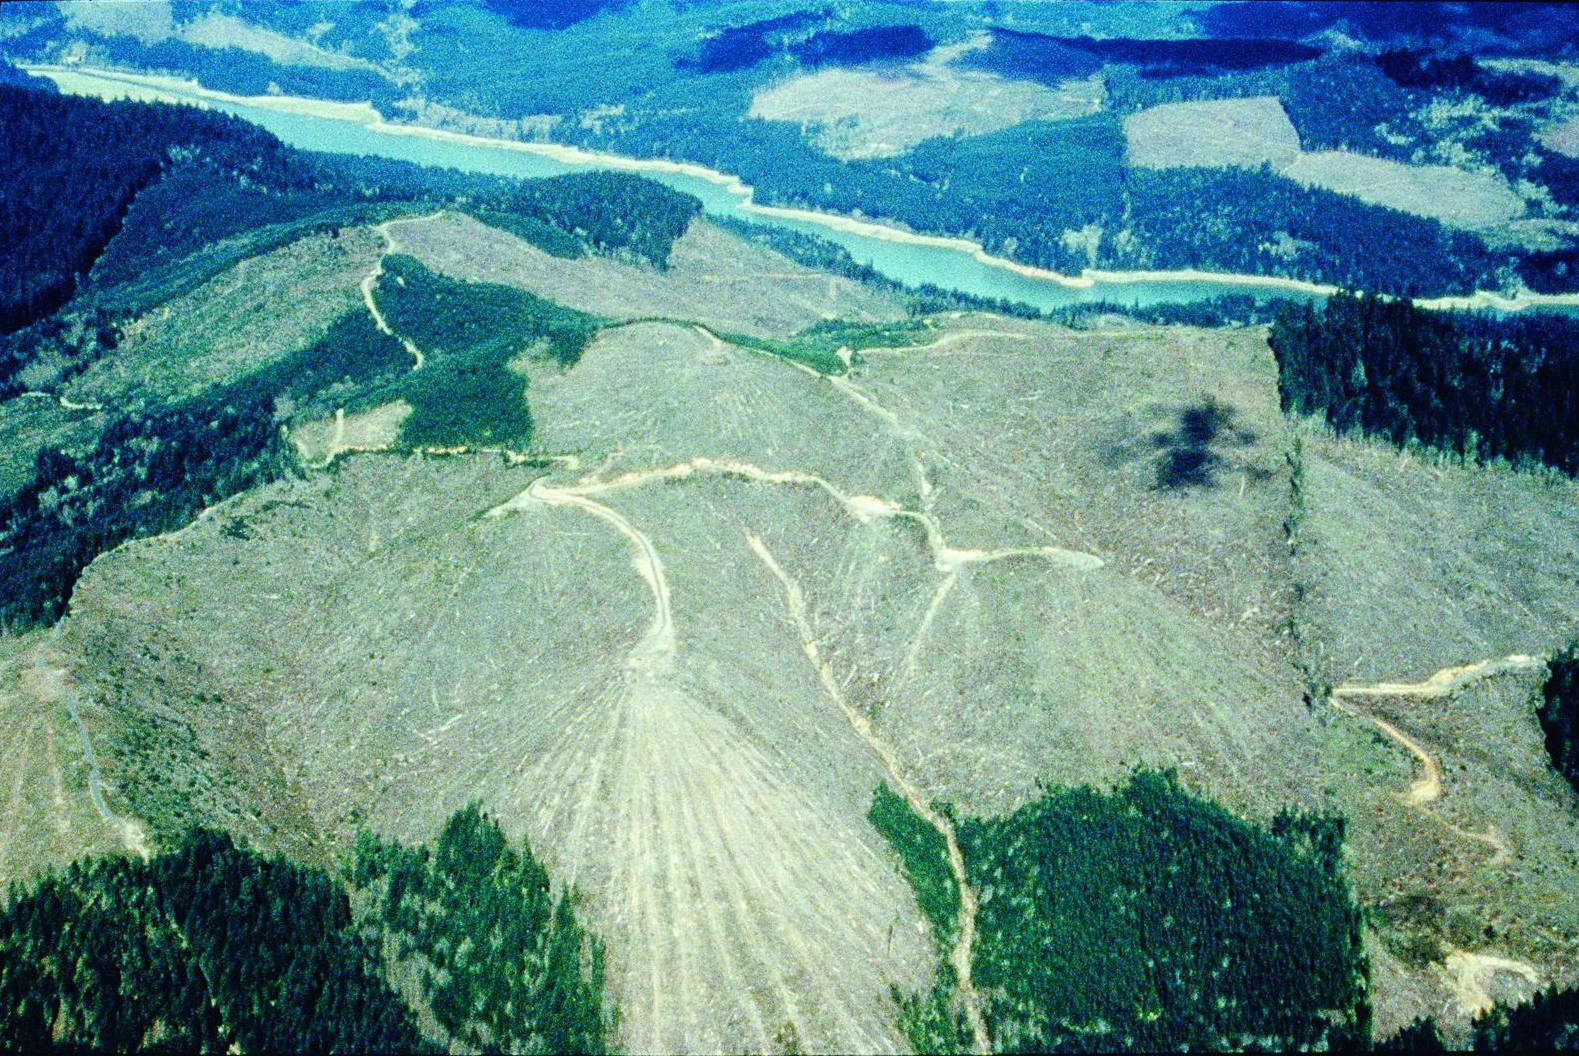 Logging in Lane County, Oregon on both public and private lands.  Source: Elizabeth Feryl, Environmental Images.